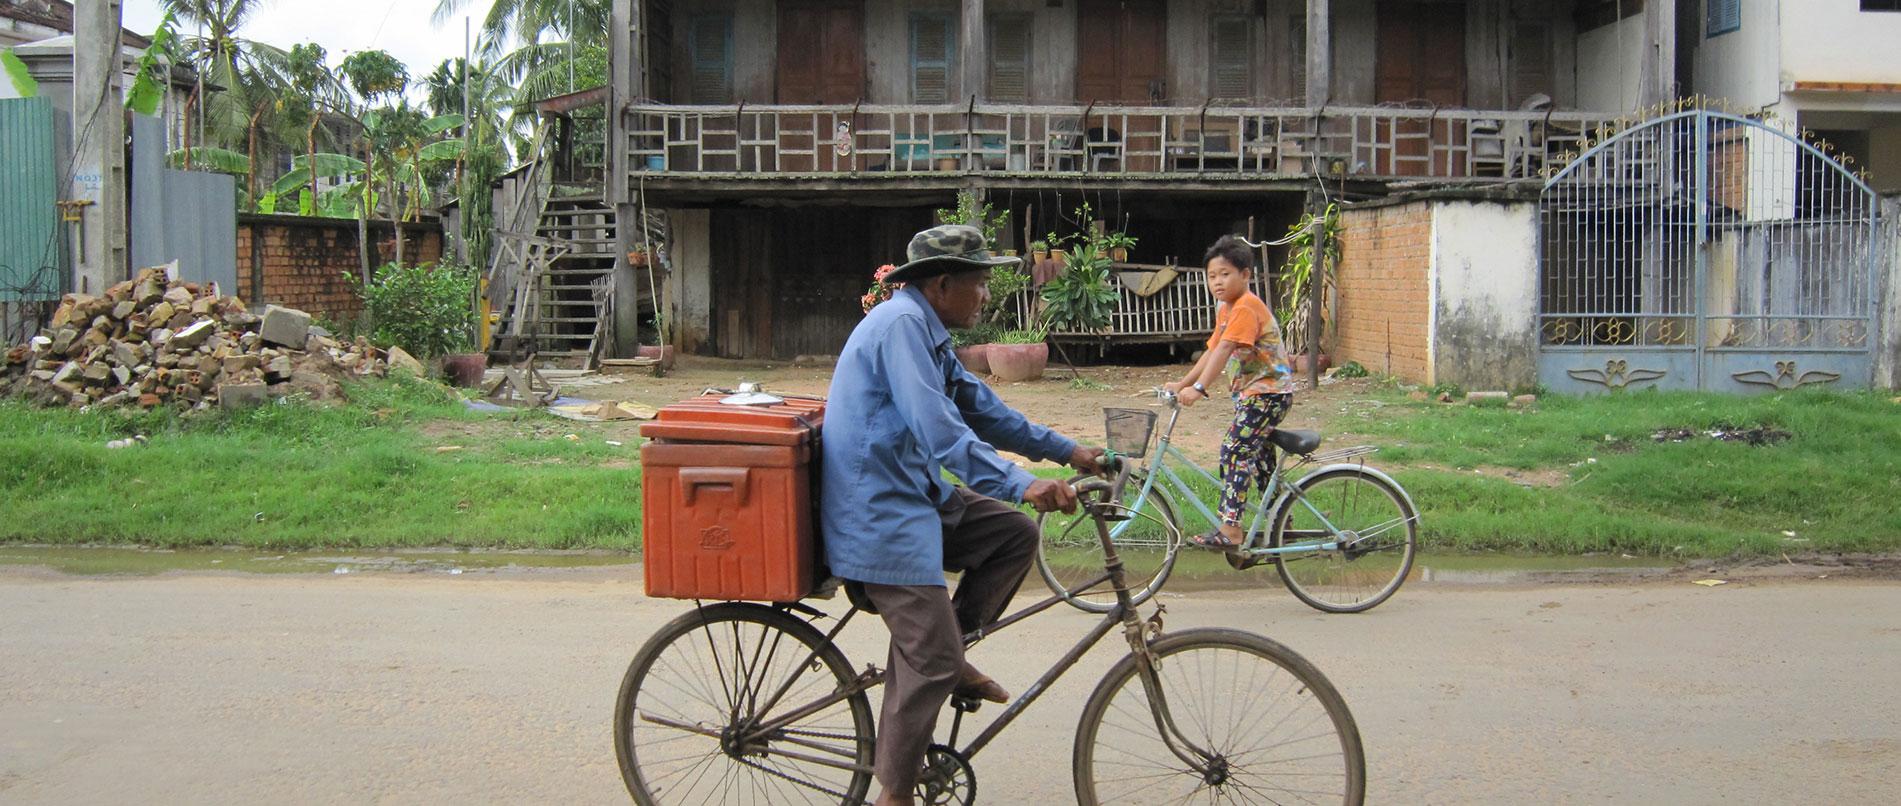 Human Rights Internship in Cambodia